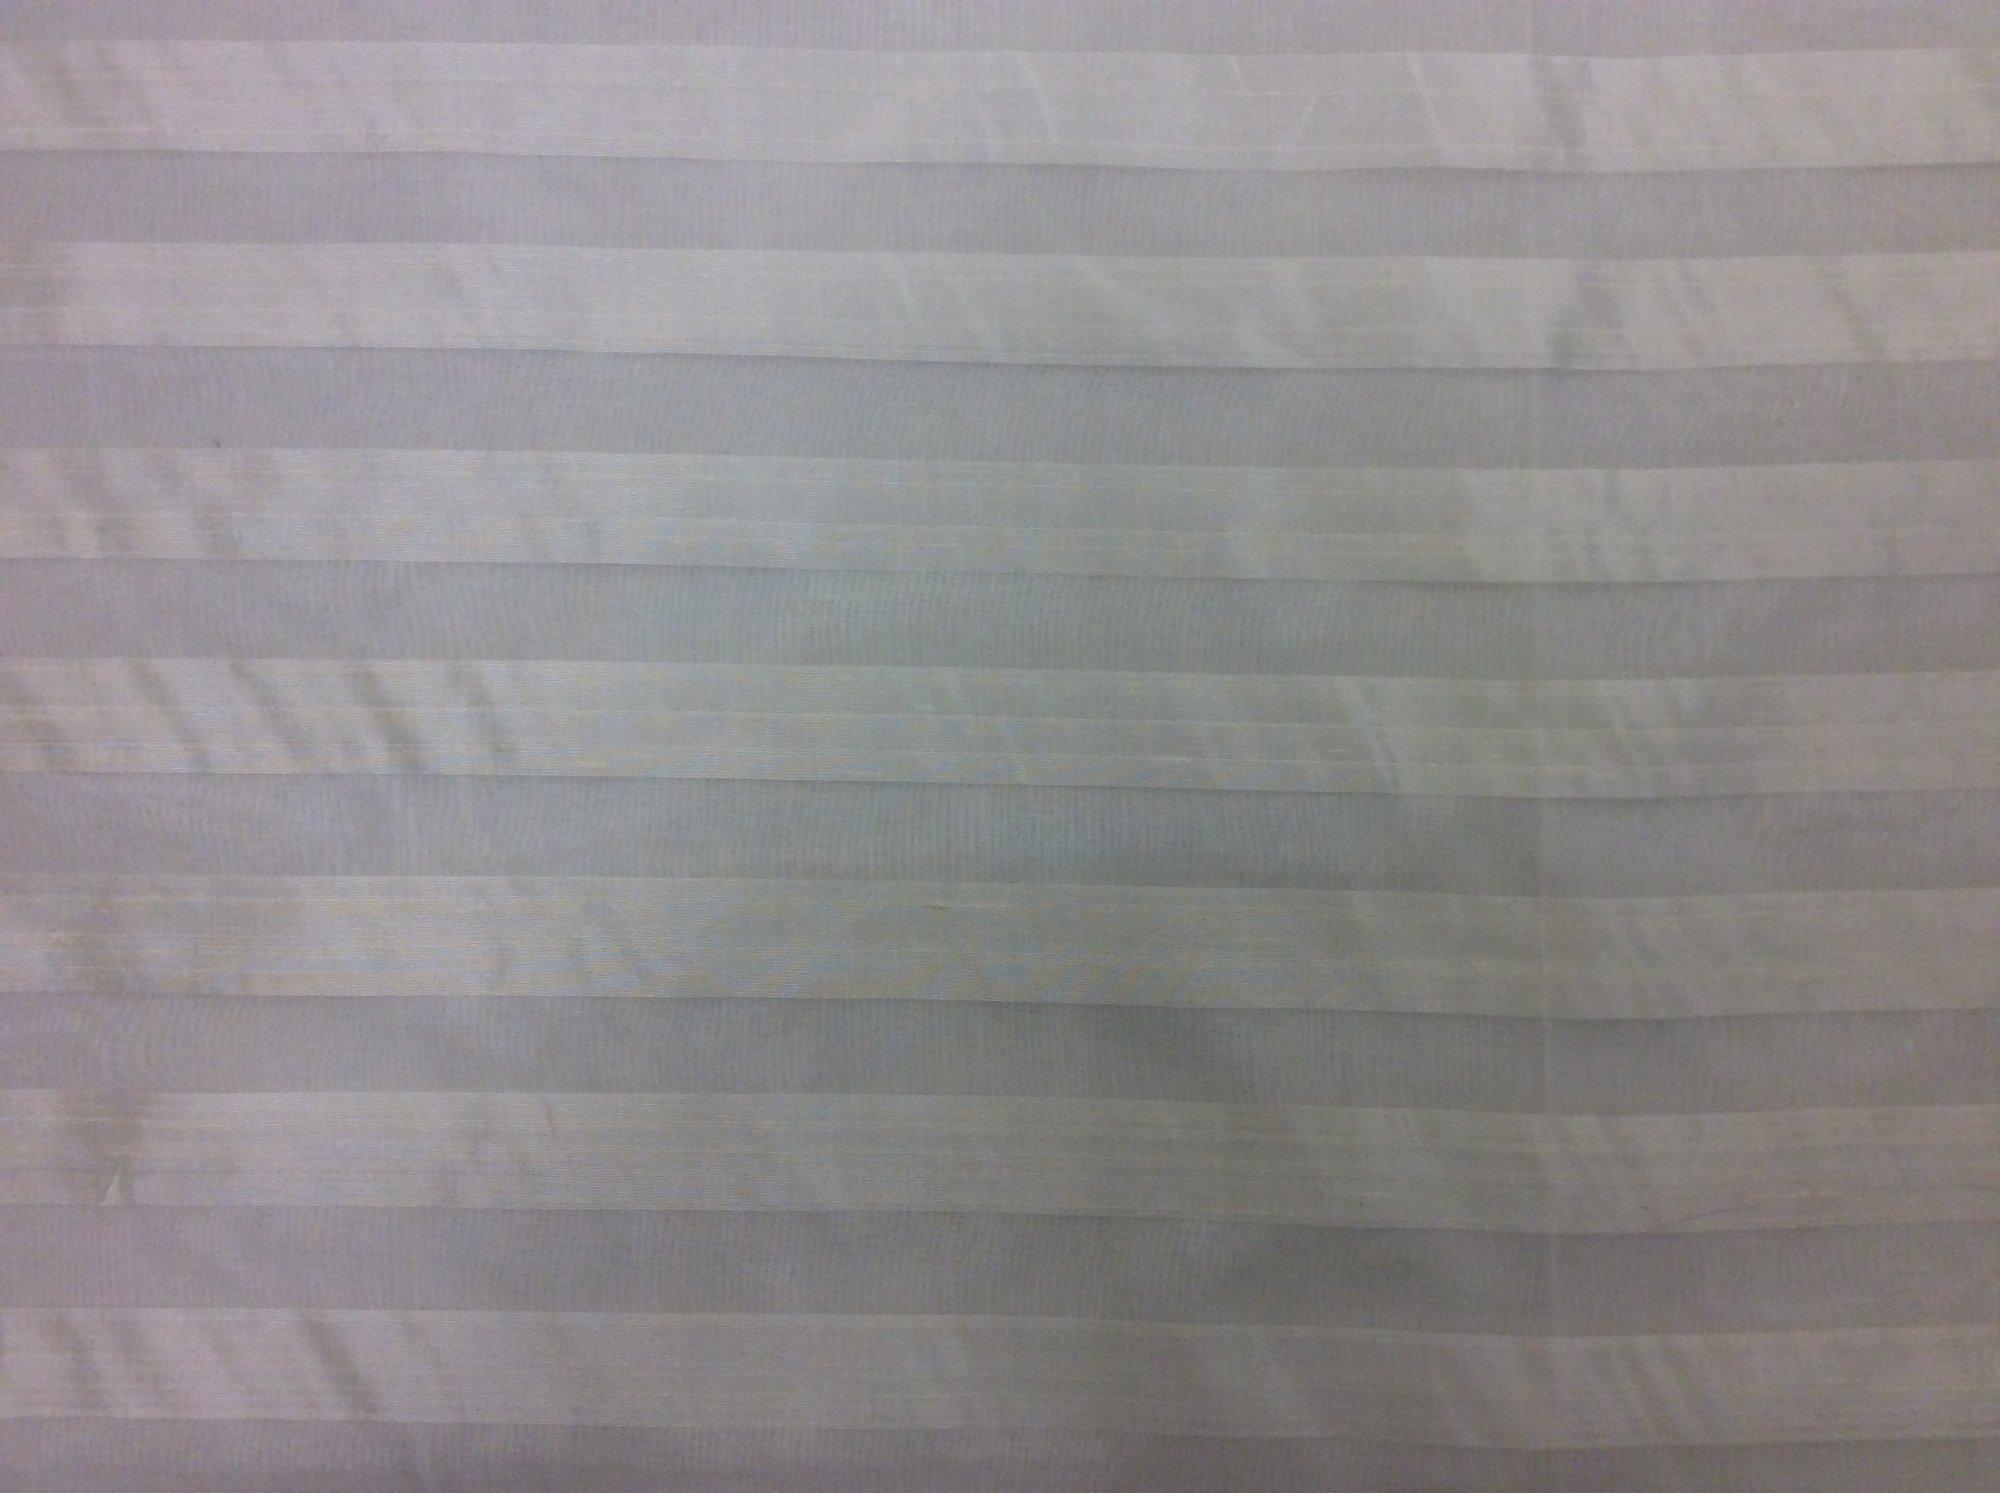 Horizontal Striped Silk Organza Off White Ivory Stripe Apparel Fabric FM420